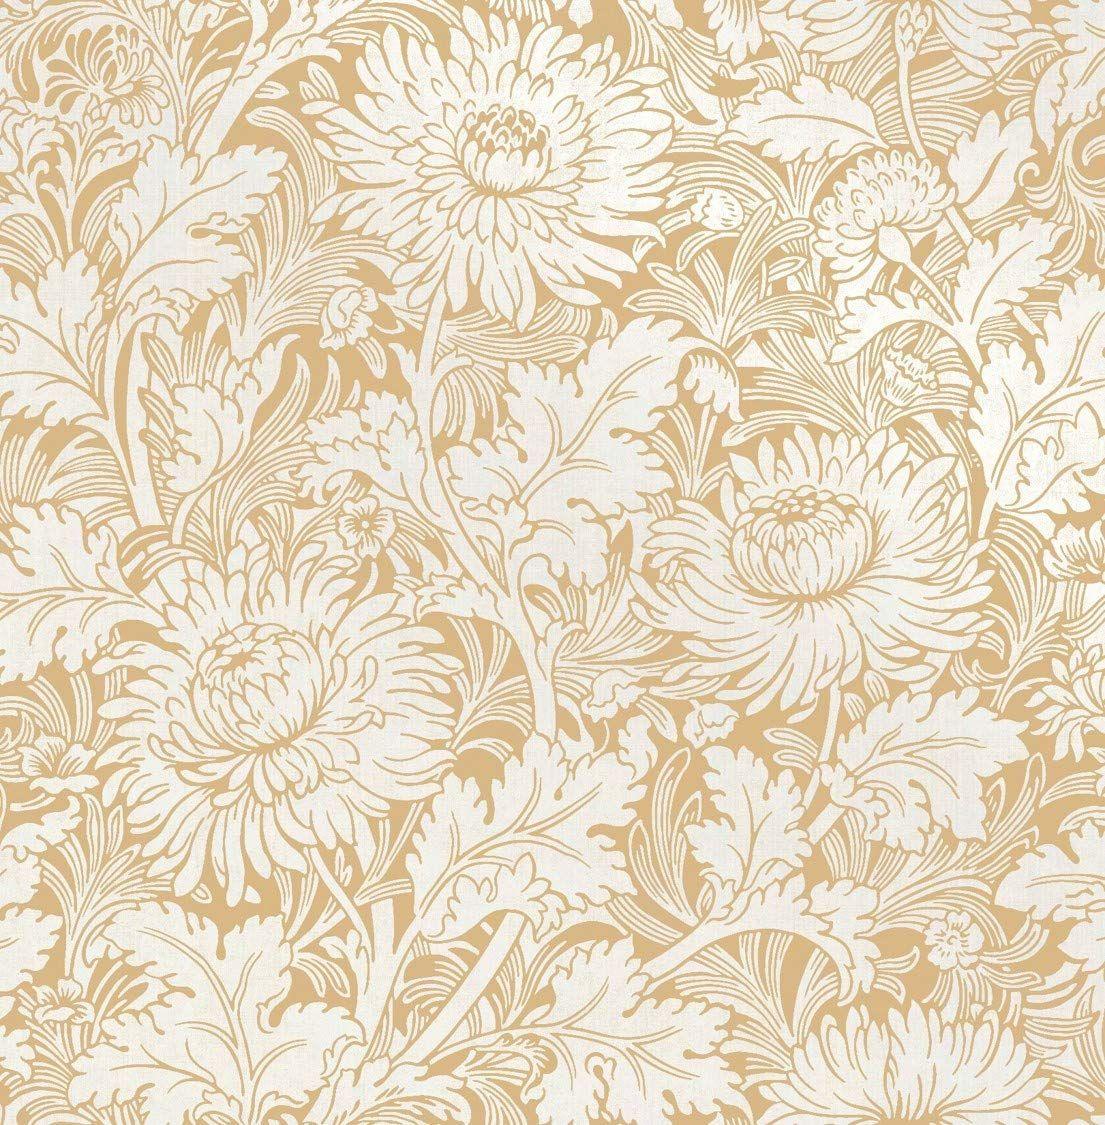 Fine Décor FD42528 Sandringham Floral Mustard Wallpaper